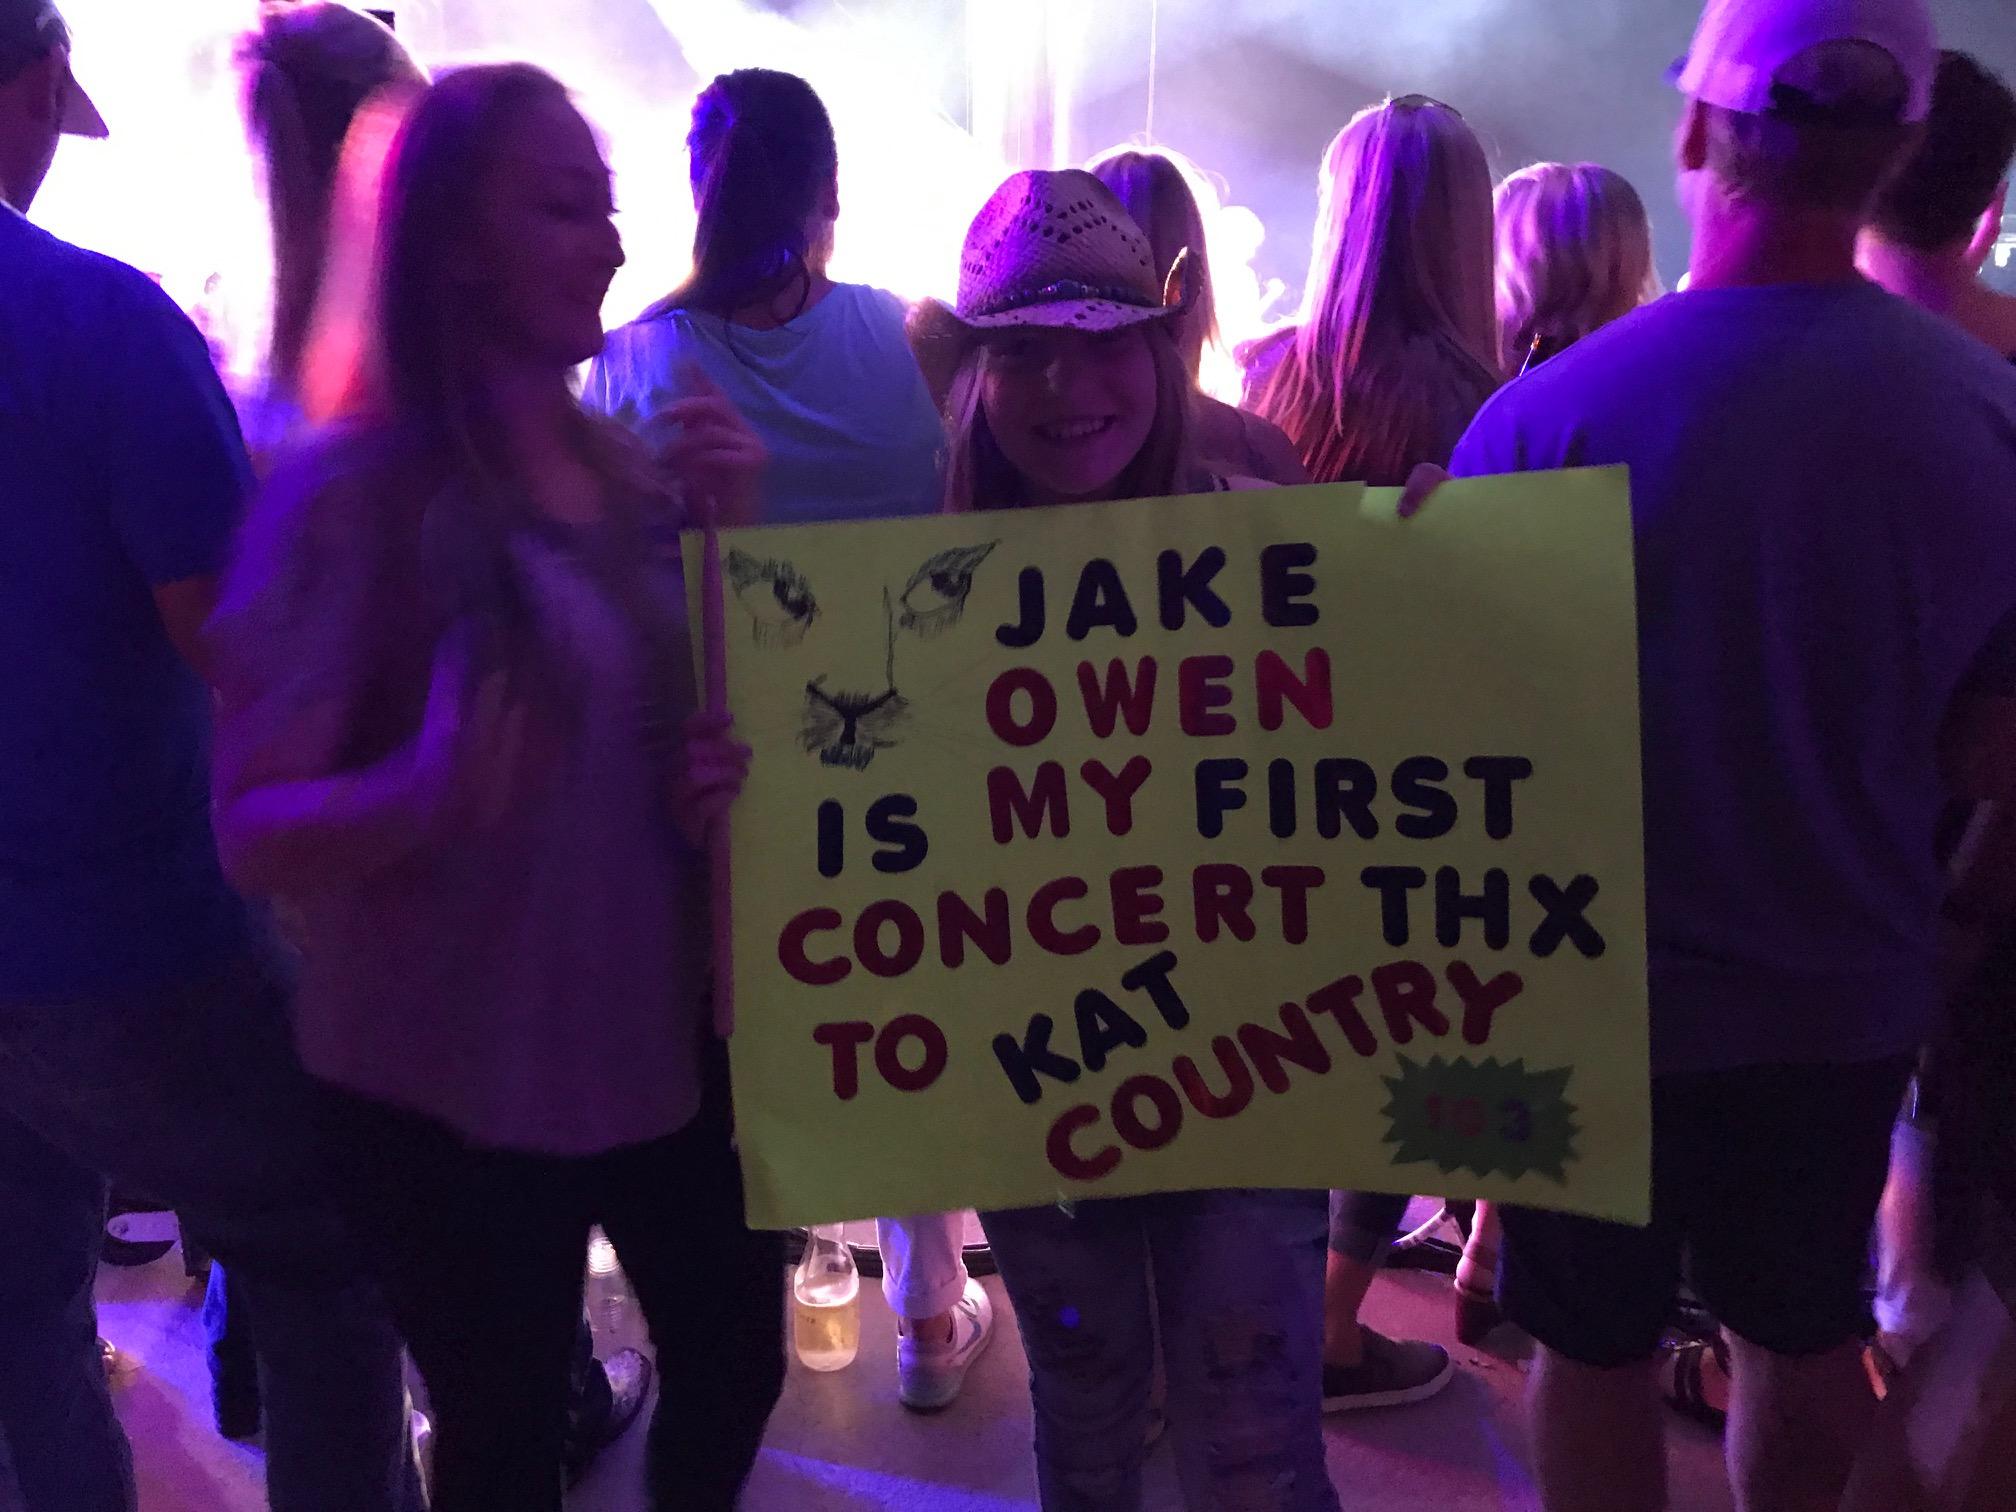 Jake Owen's Friday Night Concert At Ironstone Amphitheatre [PHOTOS]